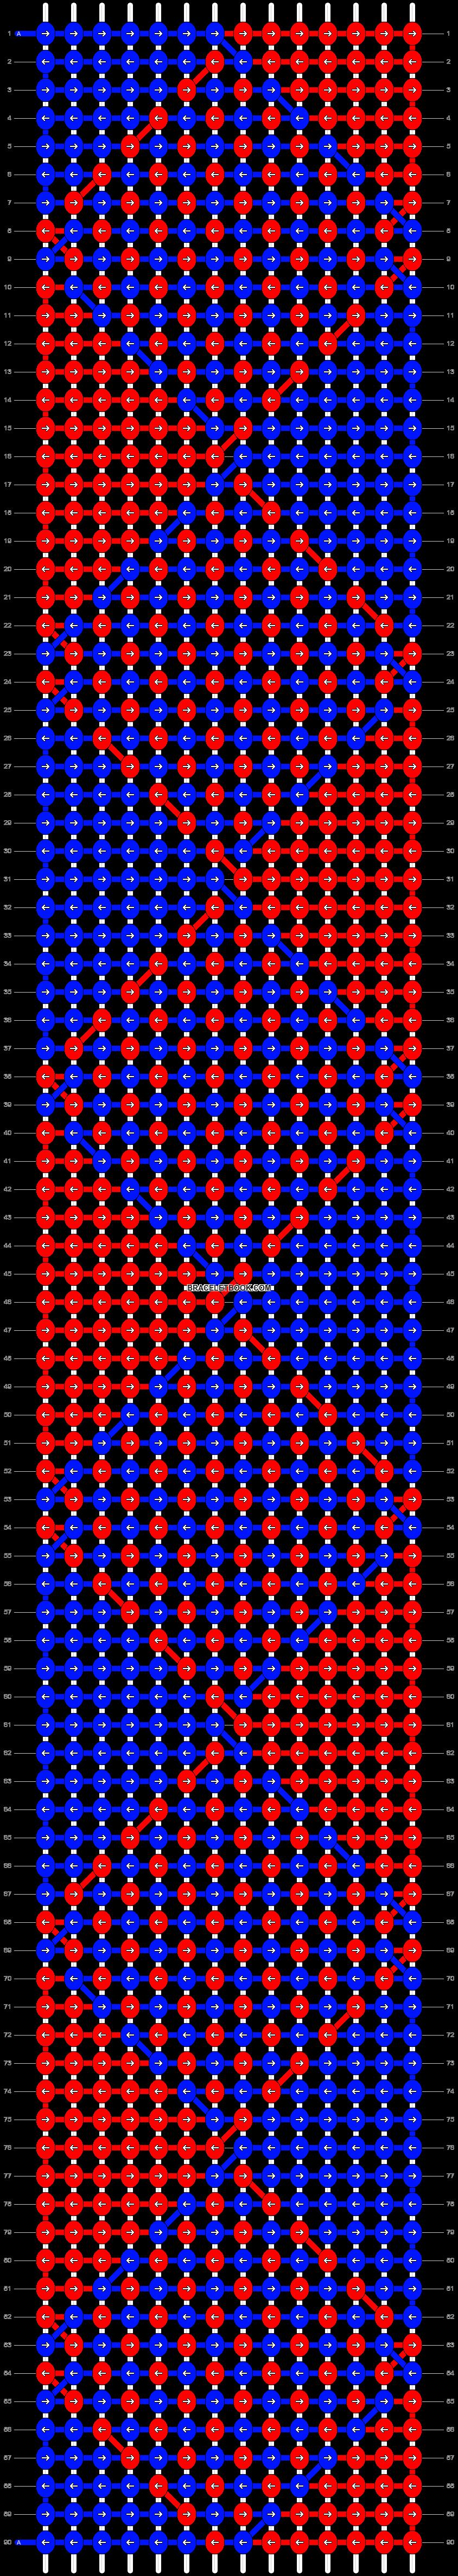 Alpha pattern #29565 variation #17753 pattern